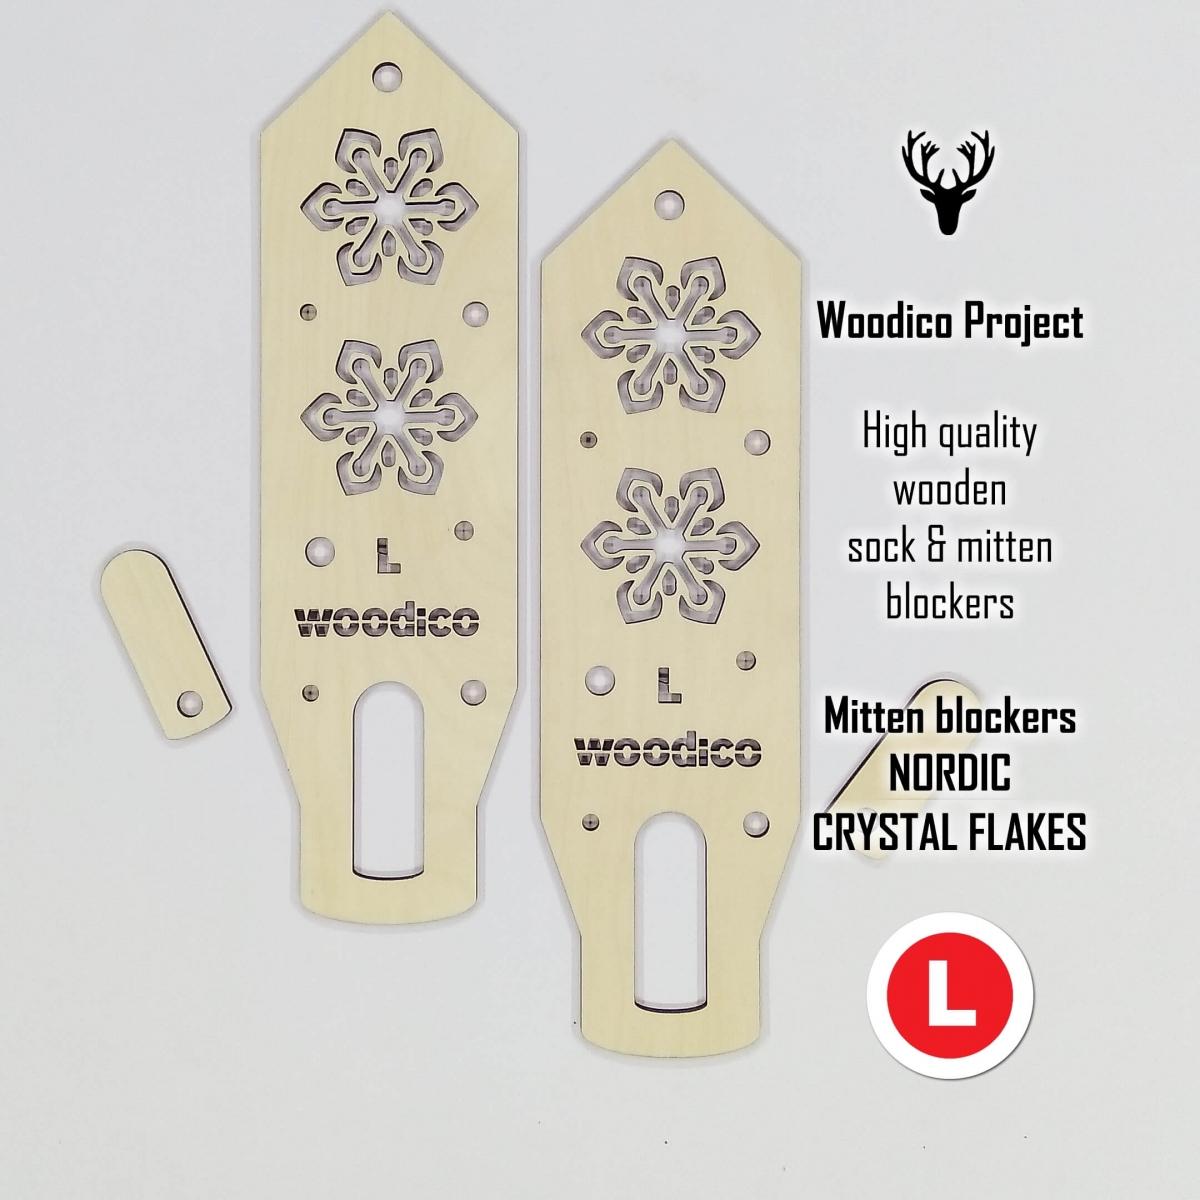 woodico.pro wooden mitten blockers crystal flakes 7 1200x1200 - Wooden mitten blockers / Nordic Crystal Flakes